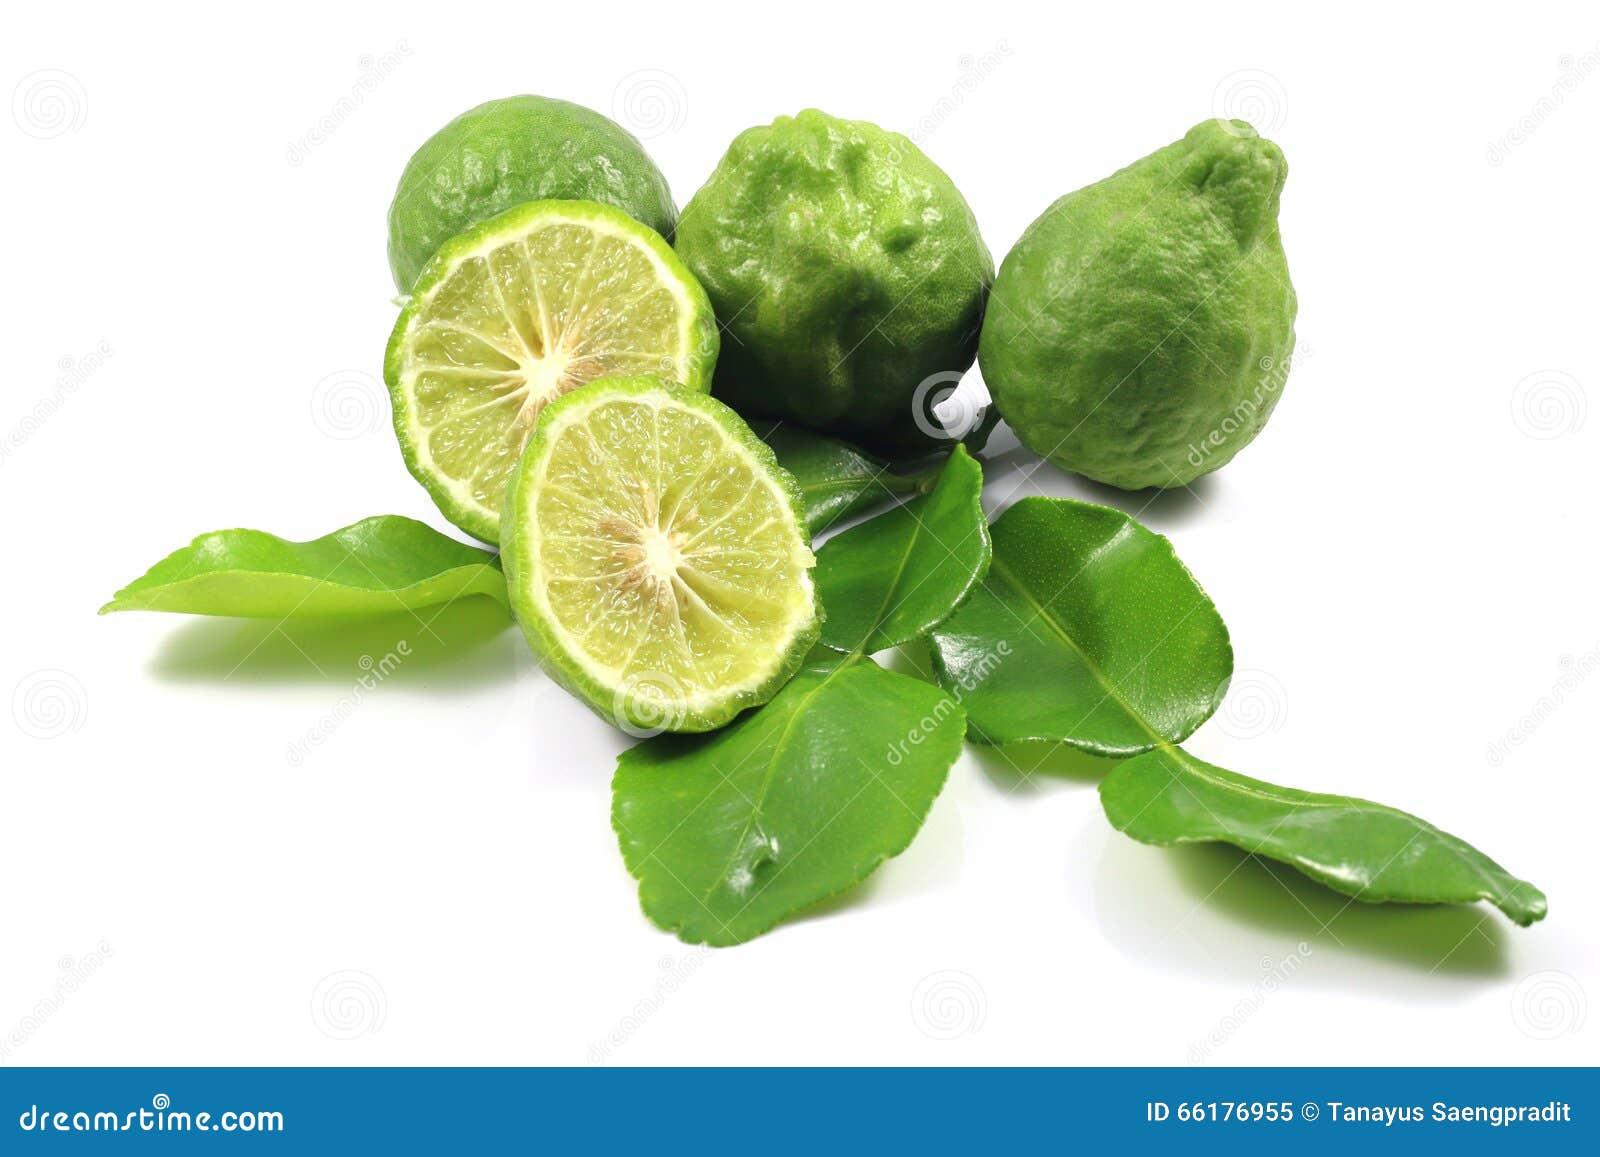 Group of bergamot and leaf